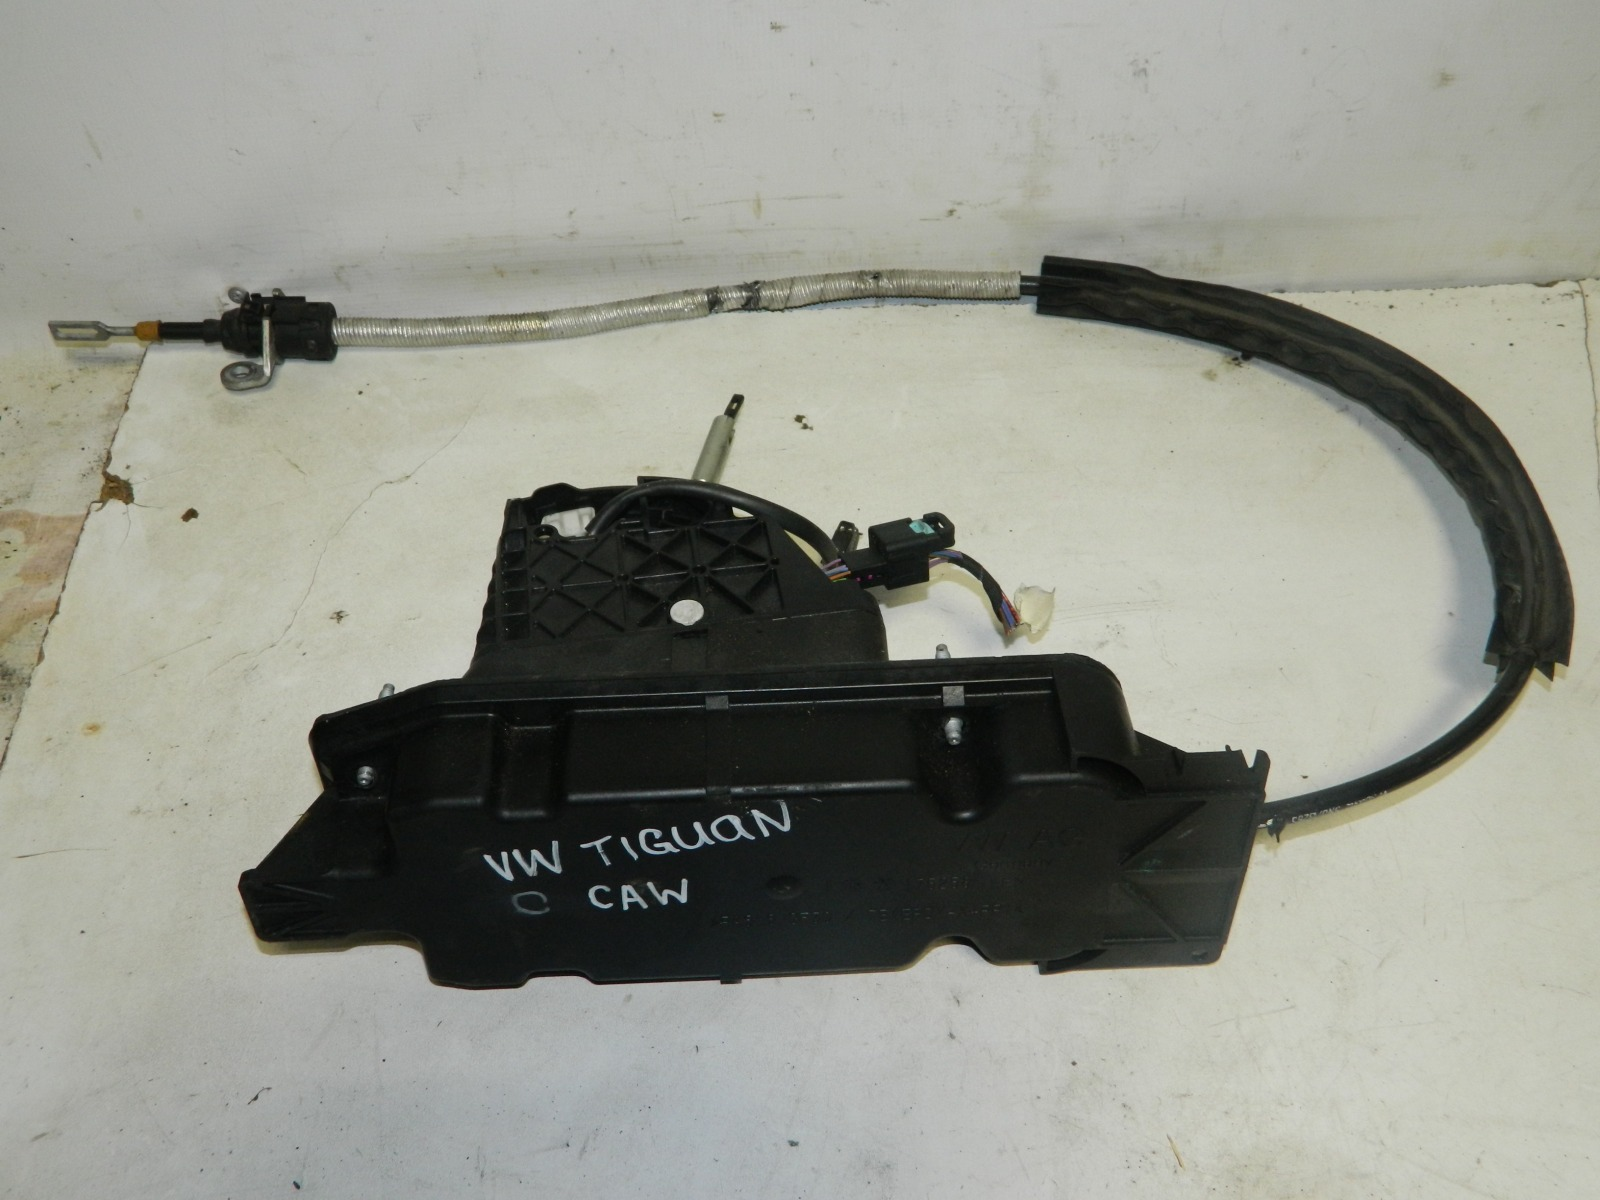 Селектор акпп Volkswagen Tiguan CAW 2008 (б/у)